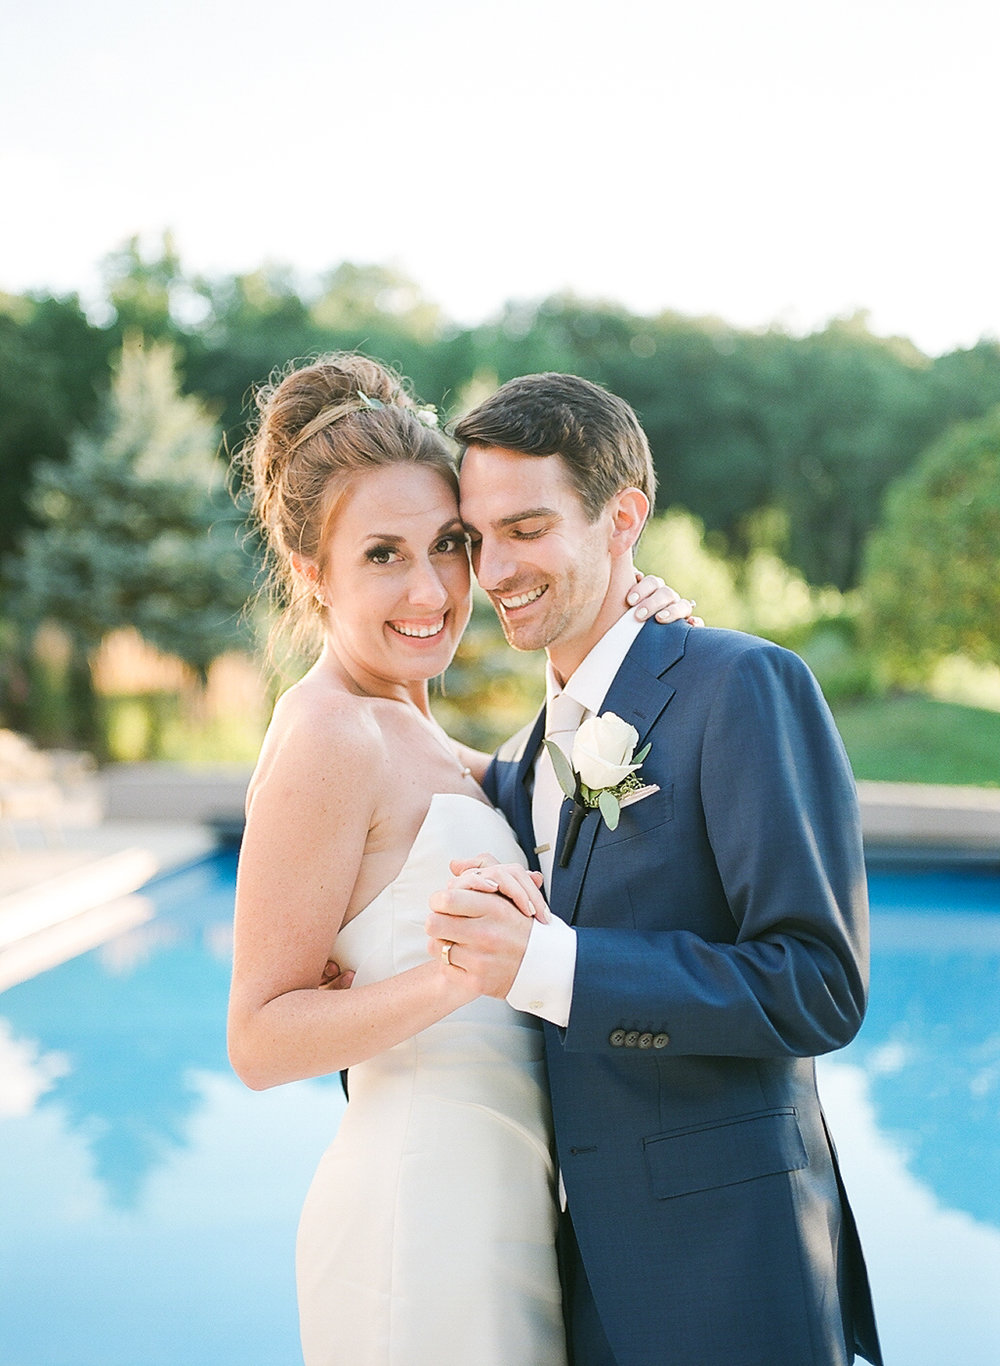 Bonphotage Chicago Fine Art Wedding Photography - Monte Bello Estate